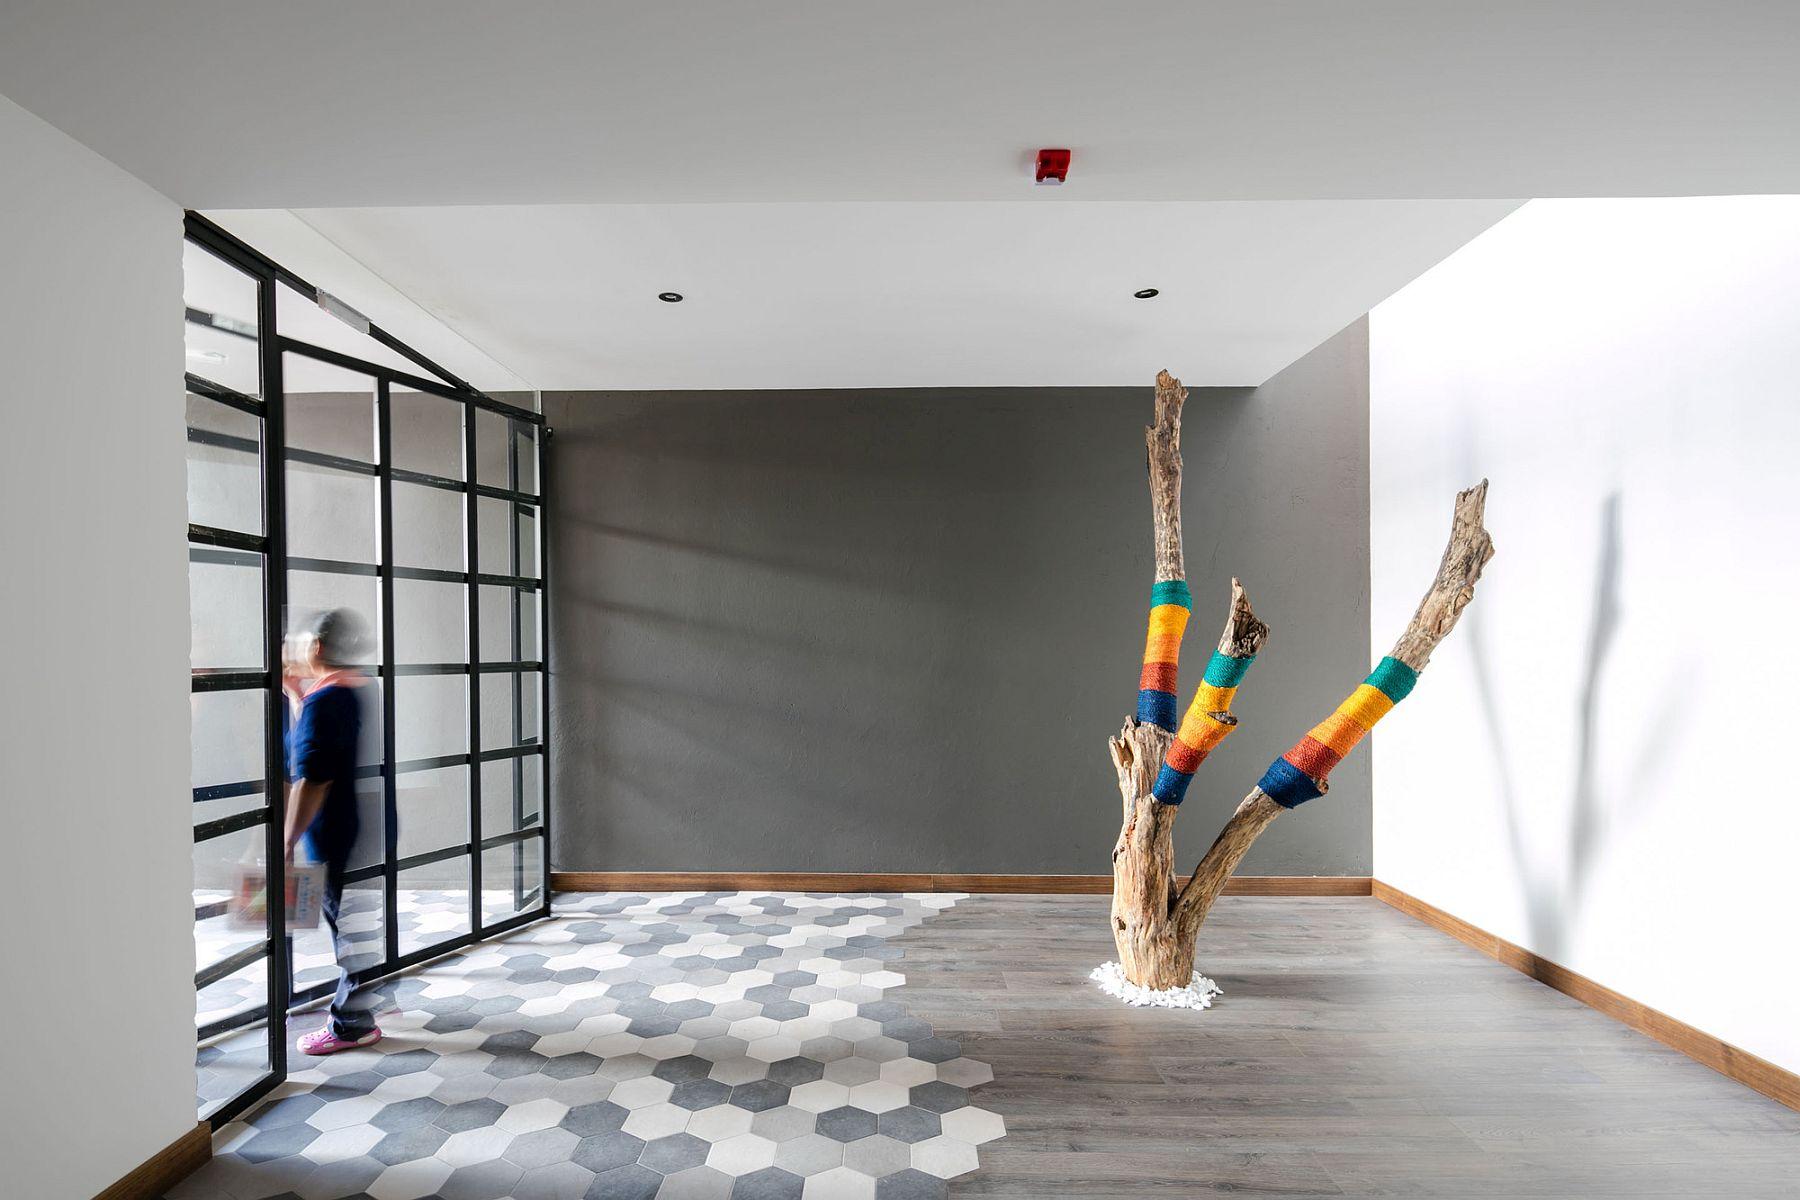 Hexagnal floor tiles bring contrast to the interior